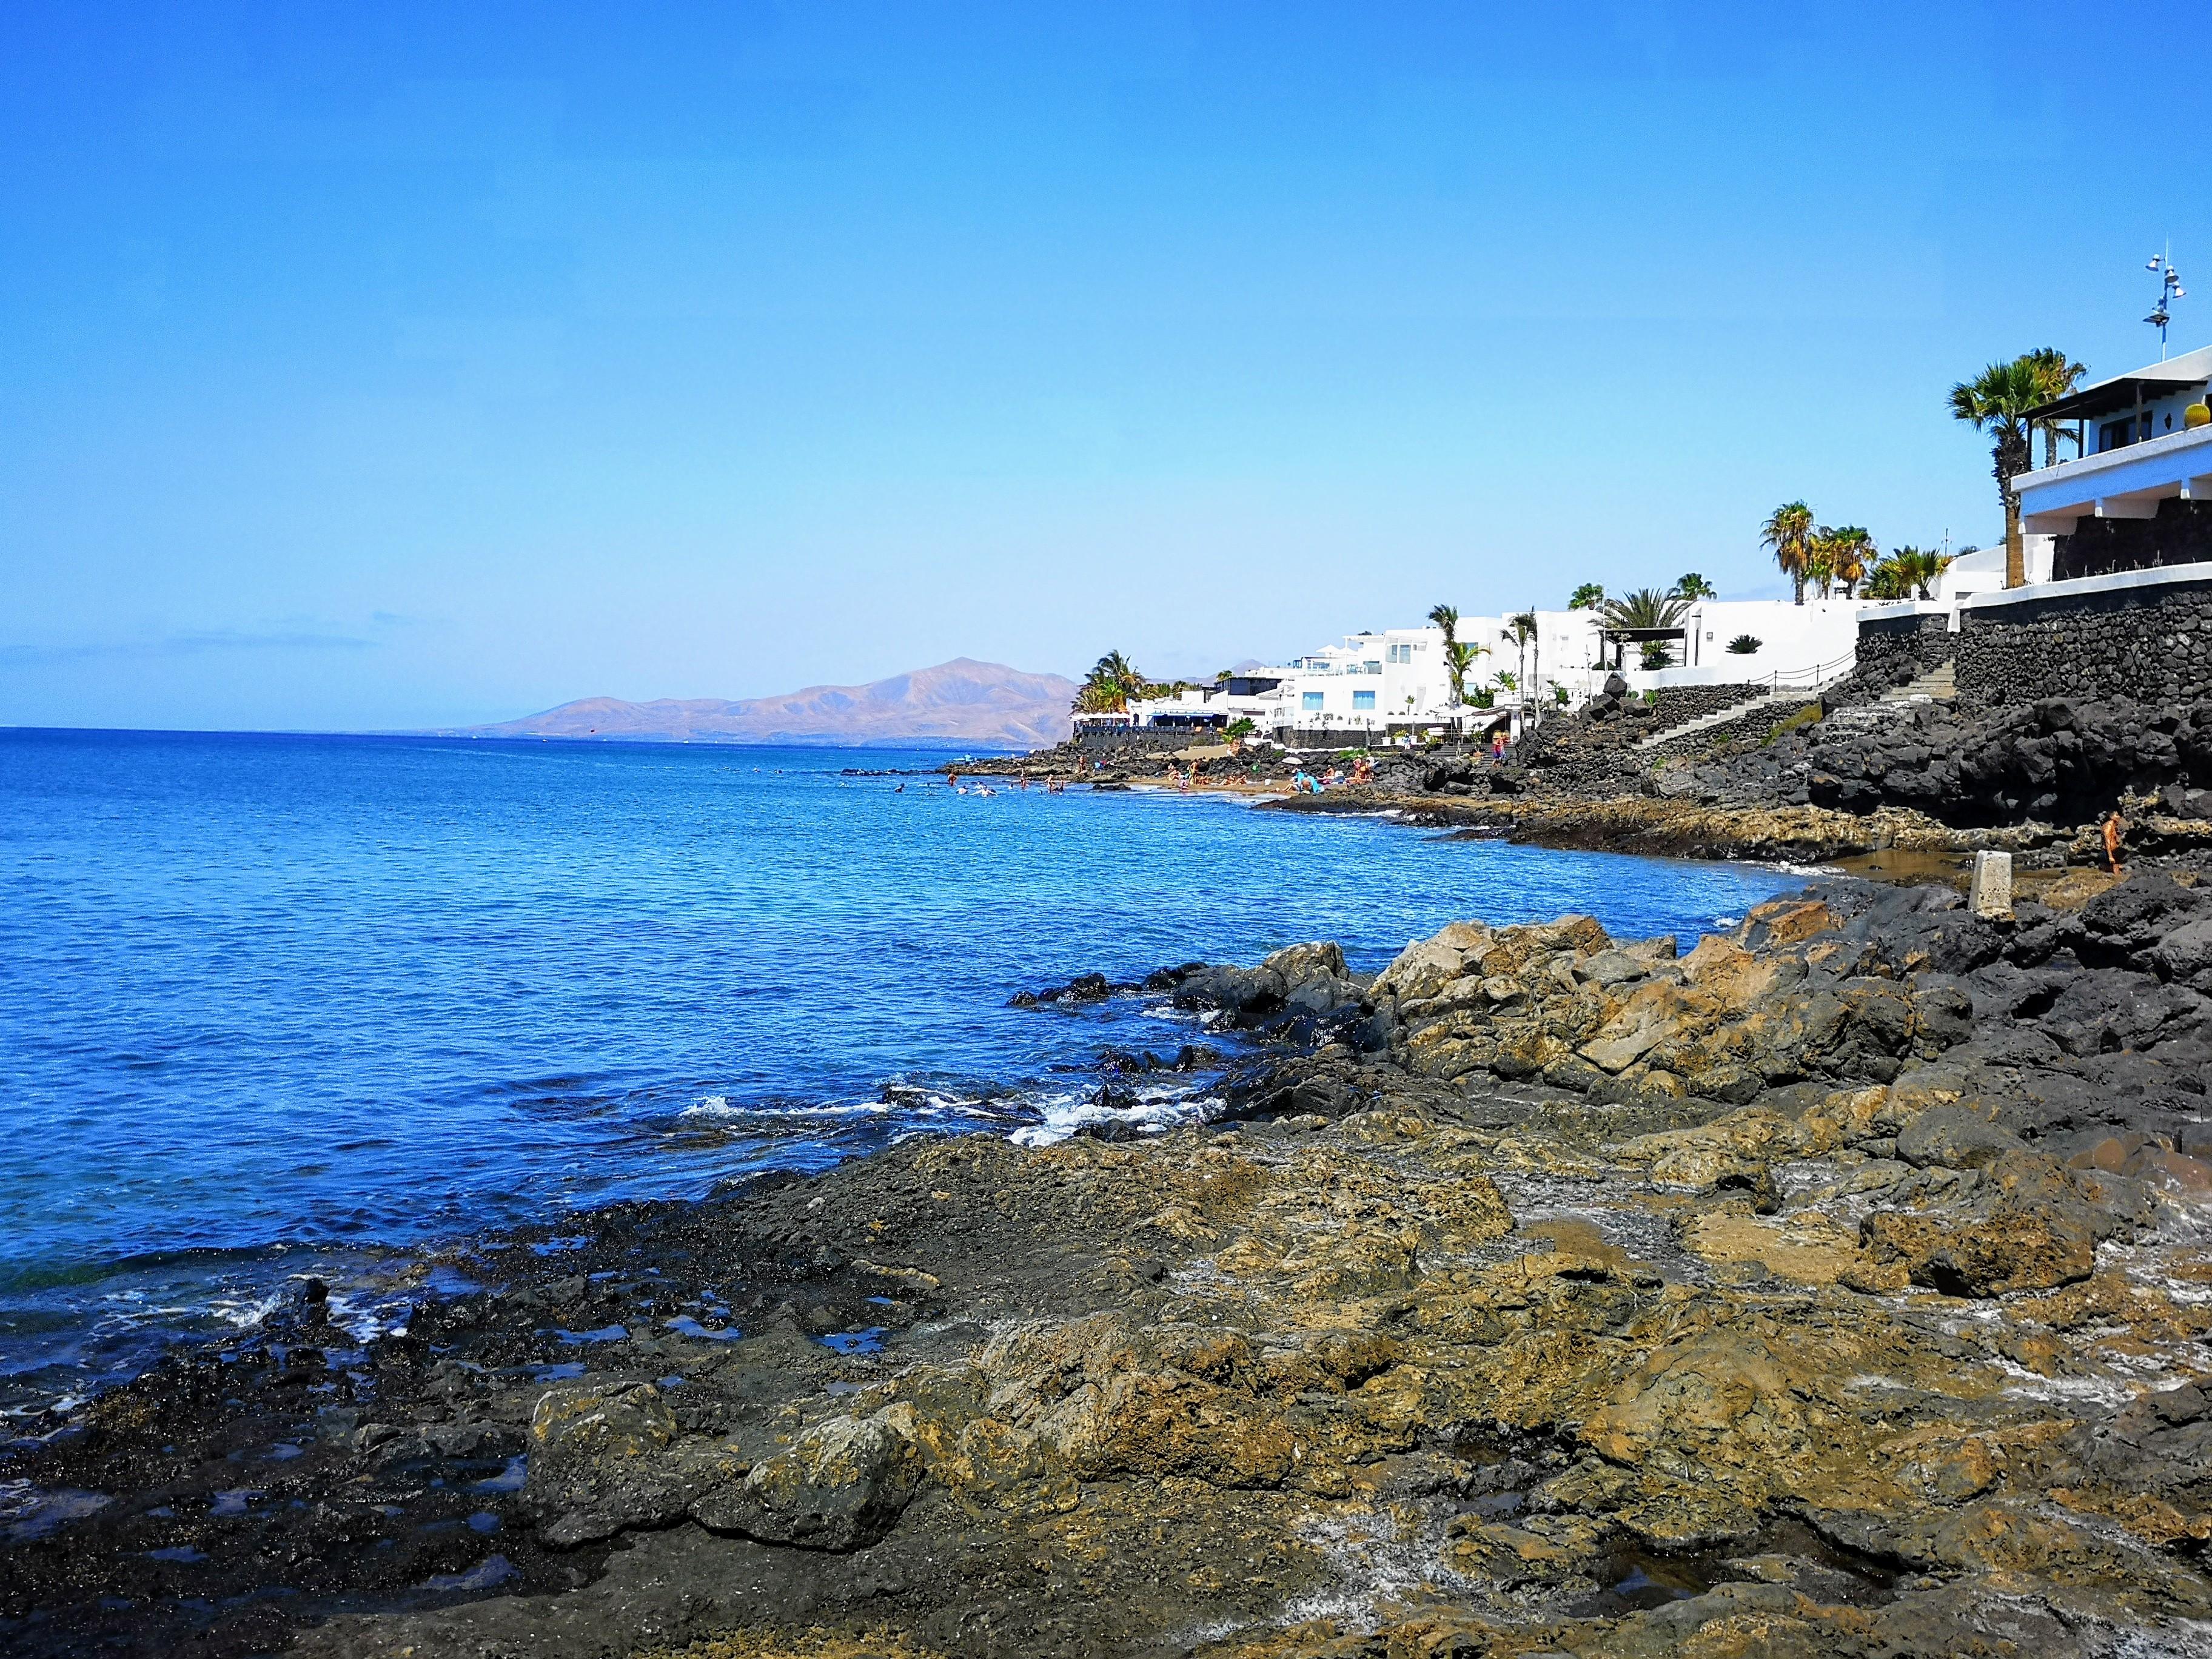 LVC328662 Coastline of Puerto del Carmen